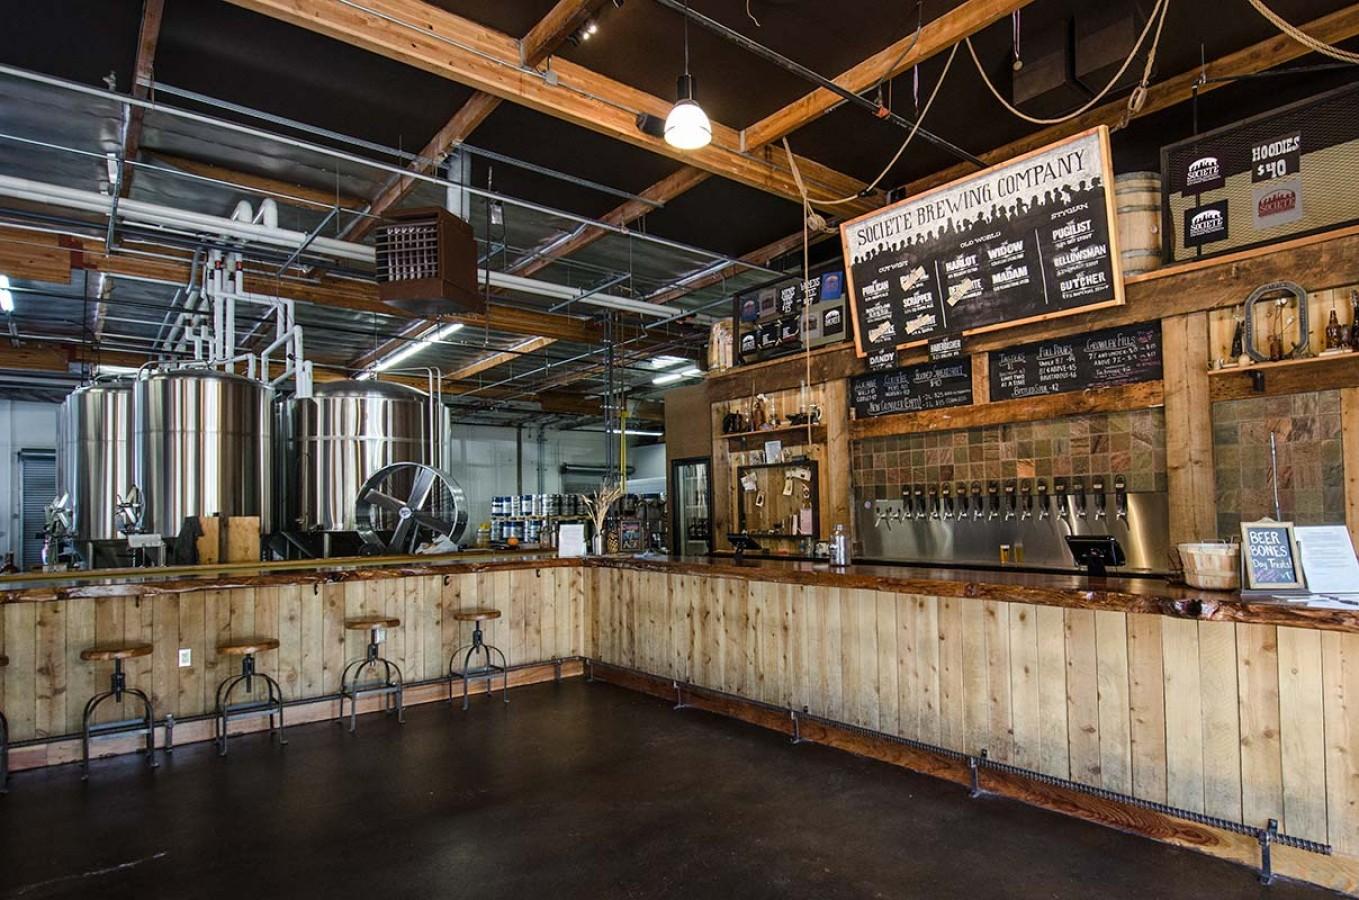 Societe Brewing Tasting Room